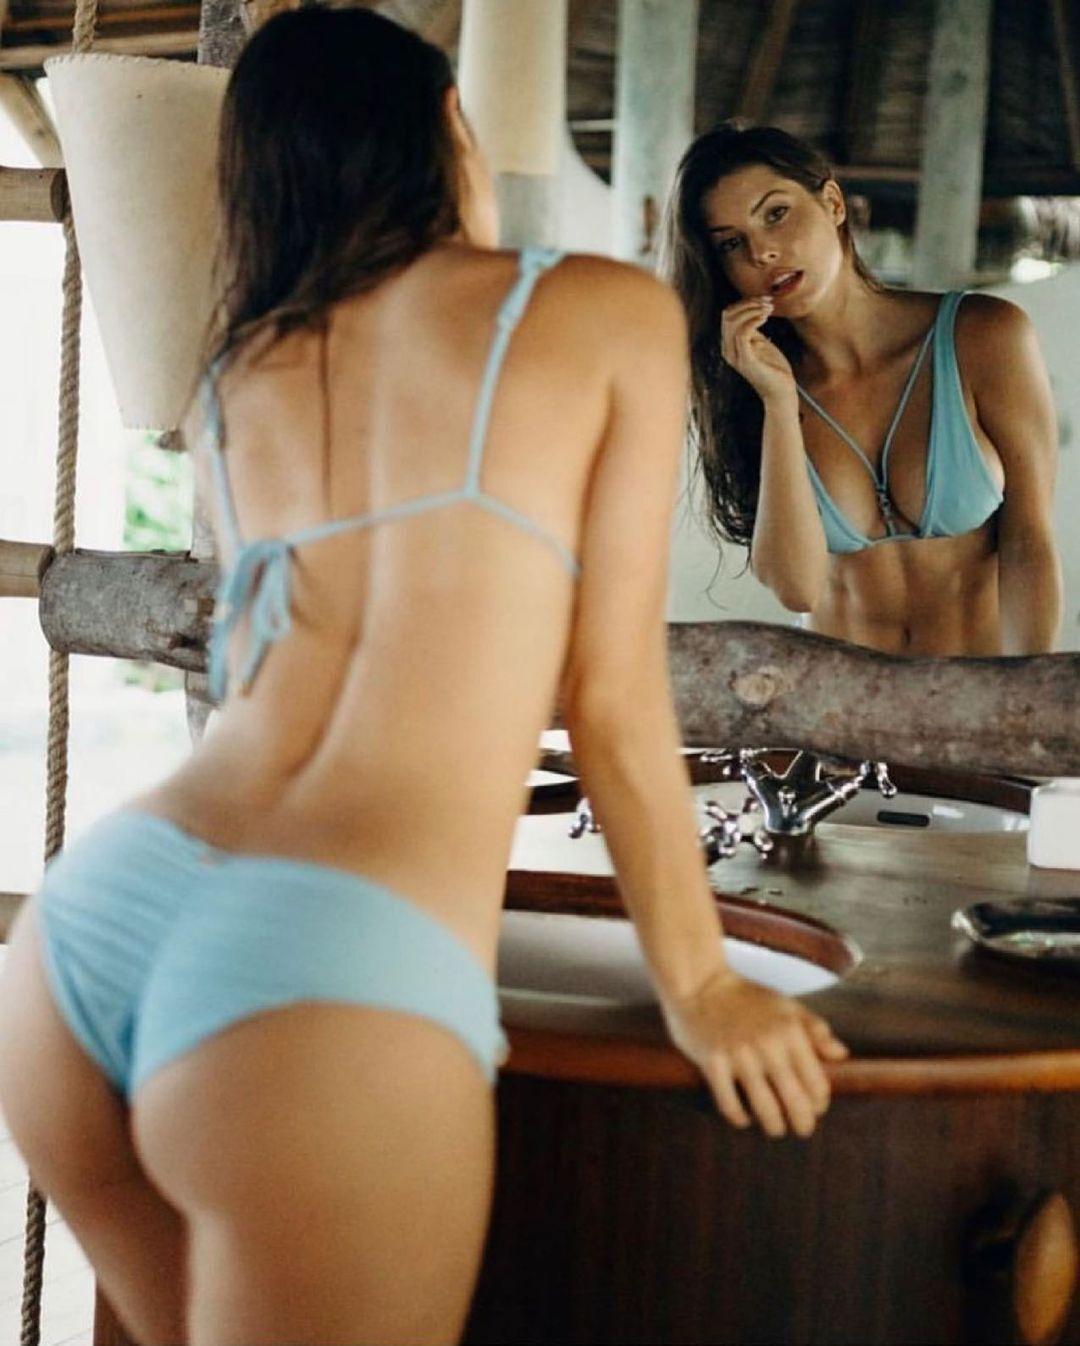 Аманда Черни перед зеркалом